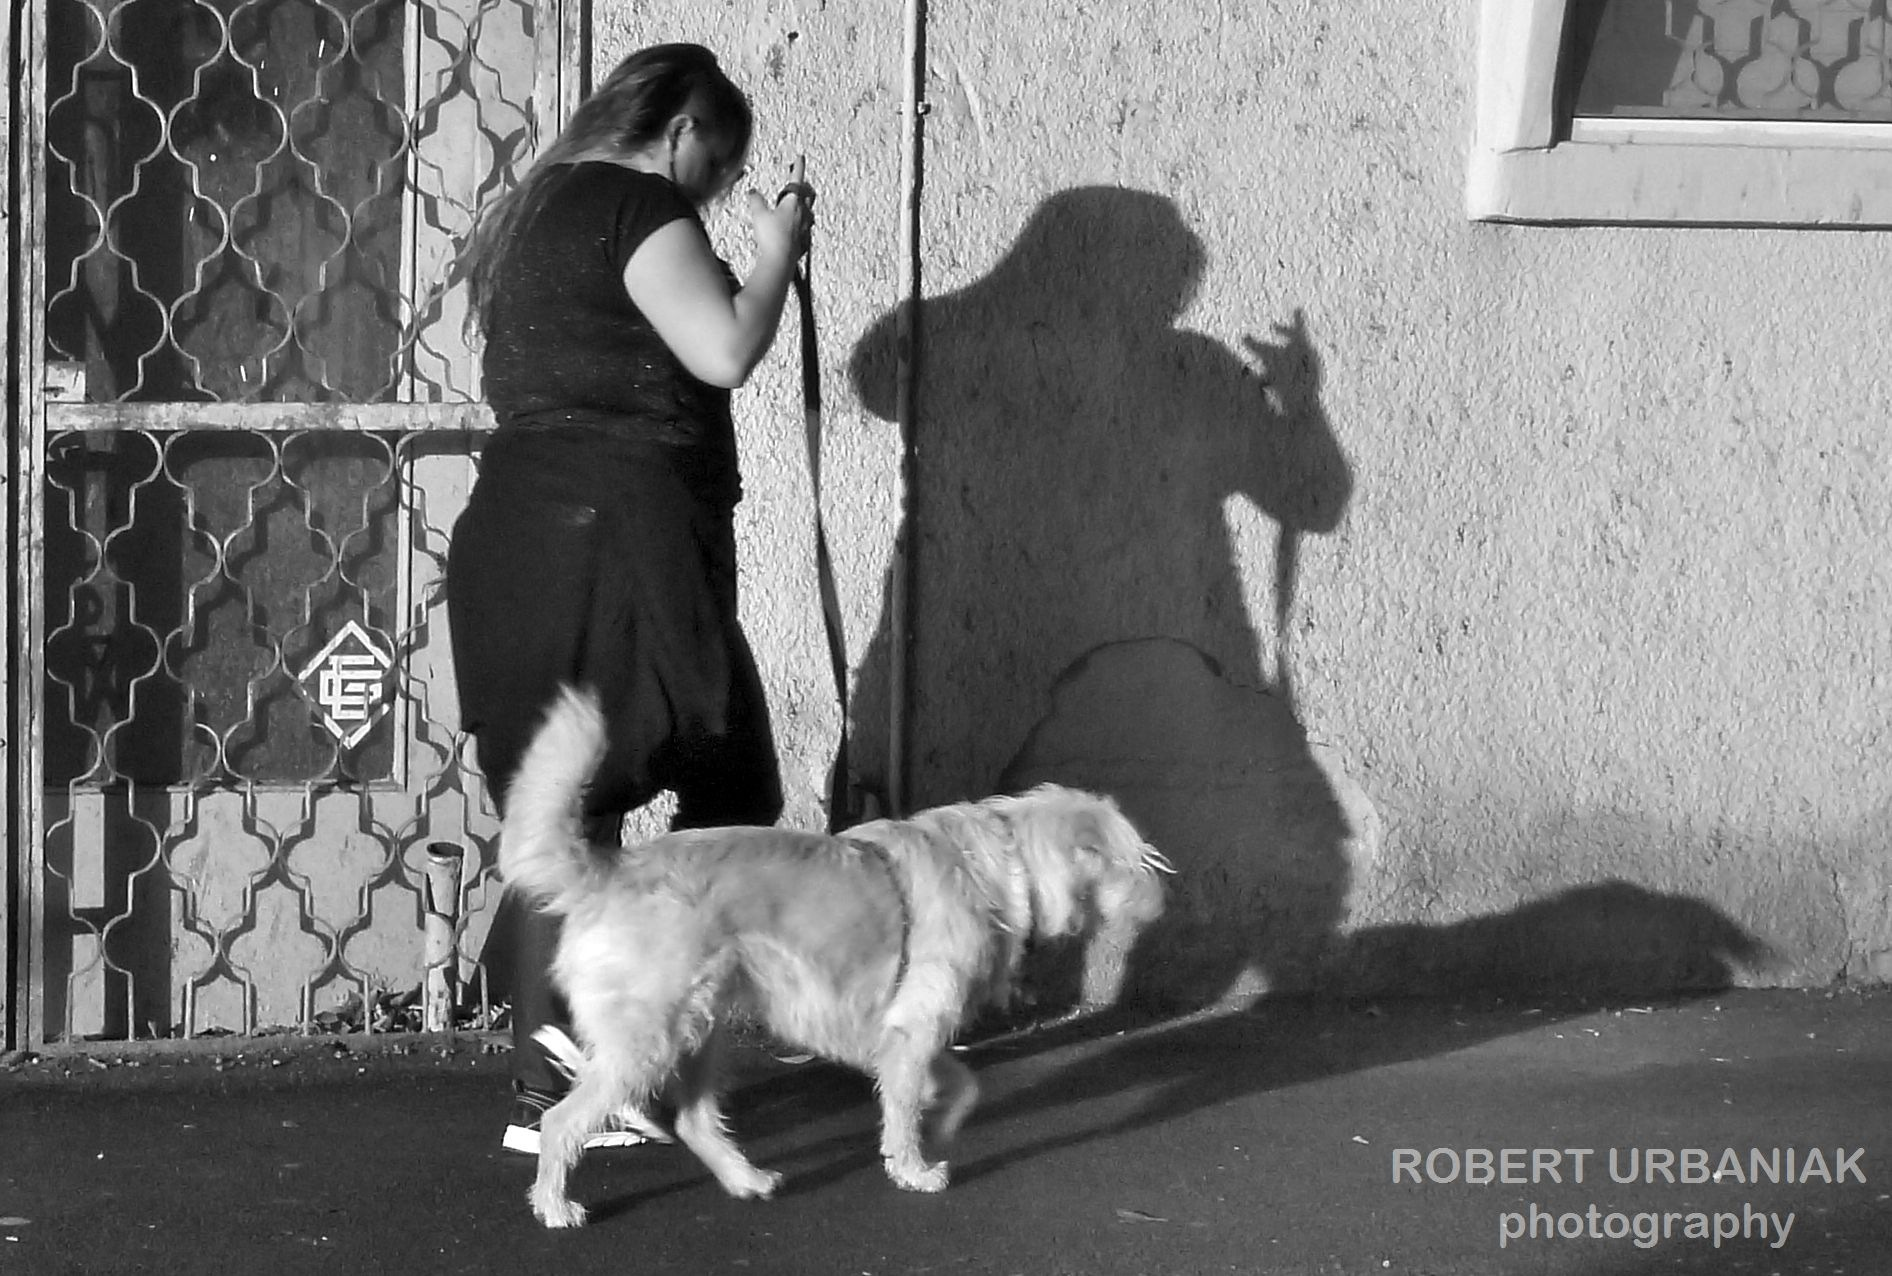 with dog in shadow by Robert Urbaniak